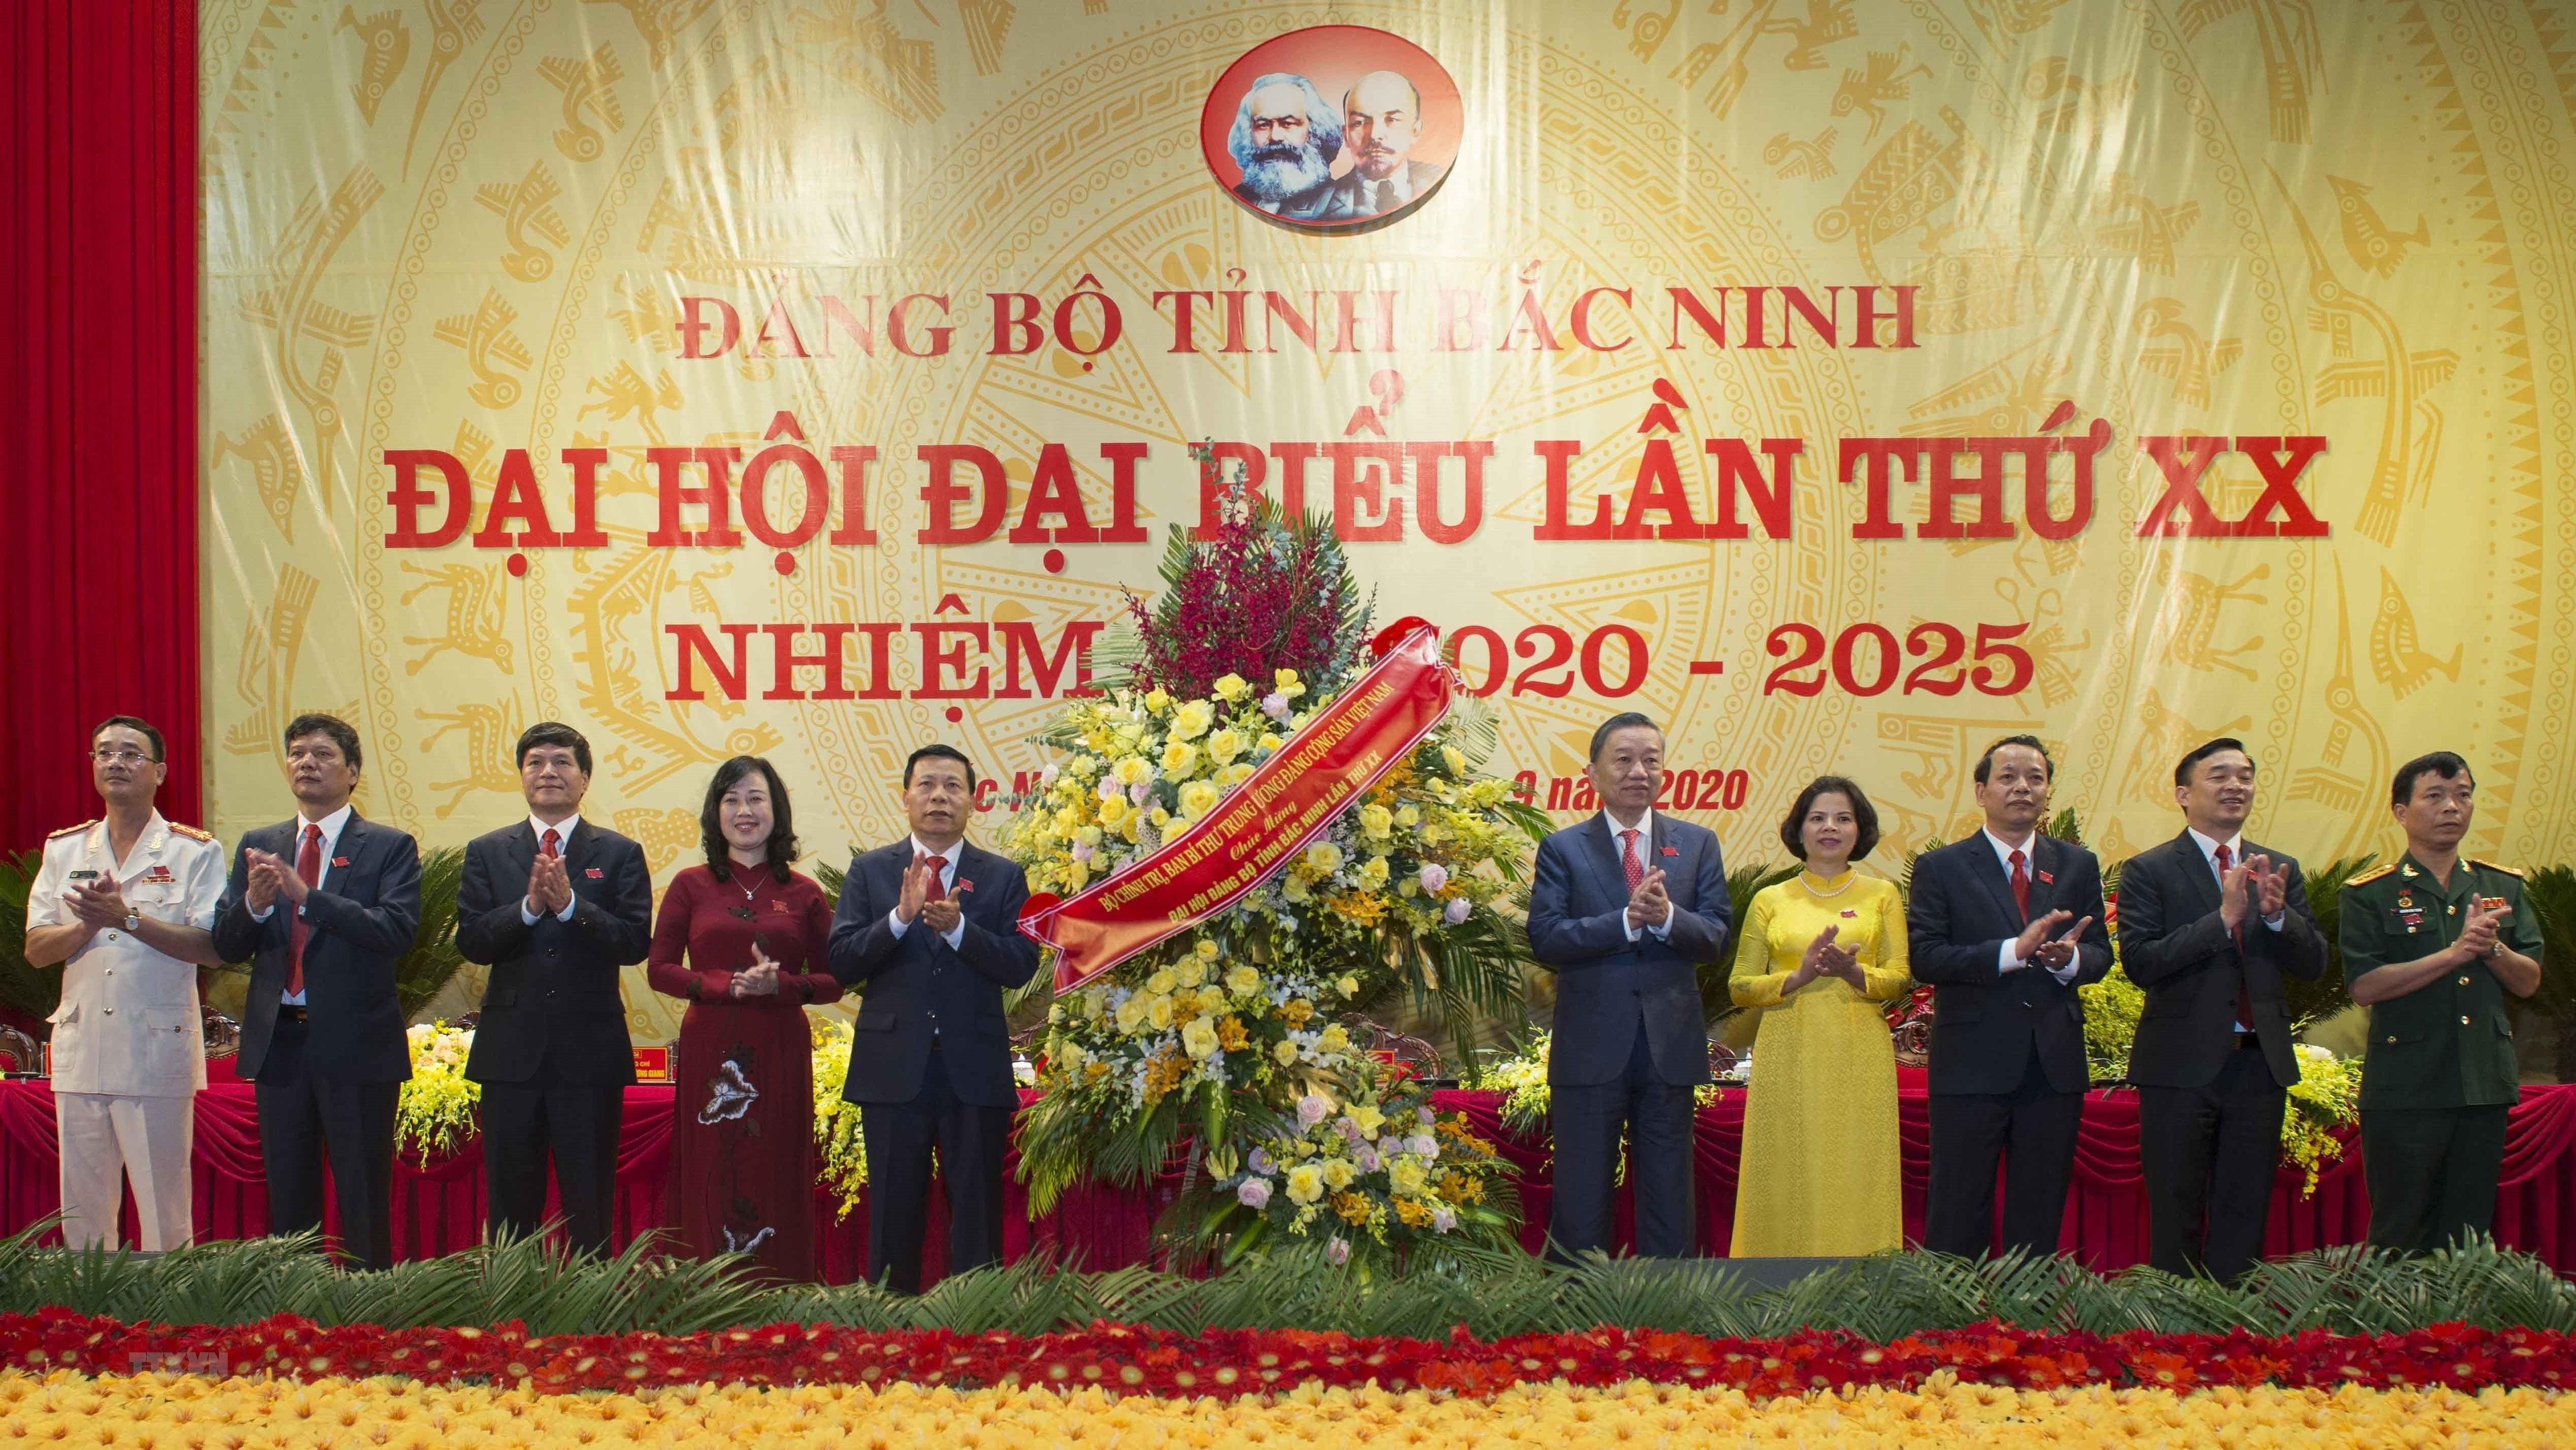 [Photo] Khai mac Dai hoi dai bieu Dang bo tinh Bac Ninh lan thu XX hinh anh 2